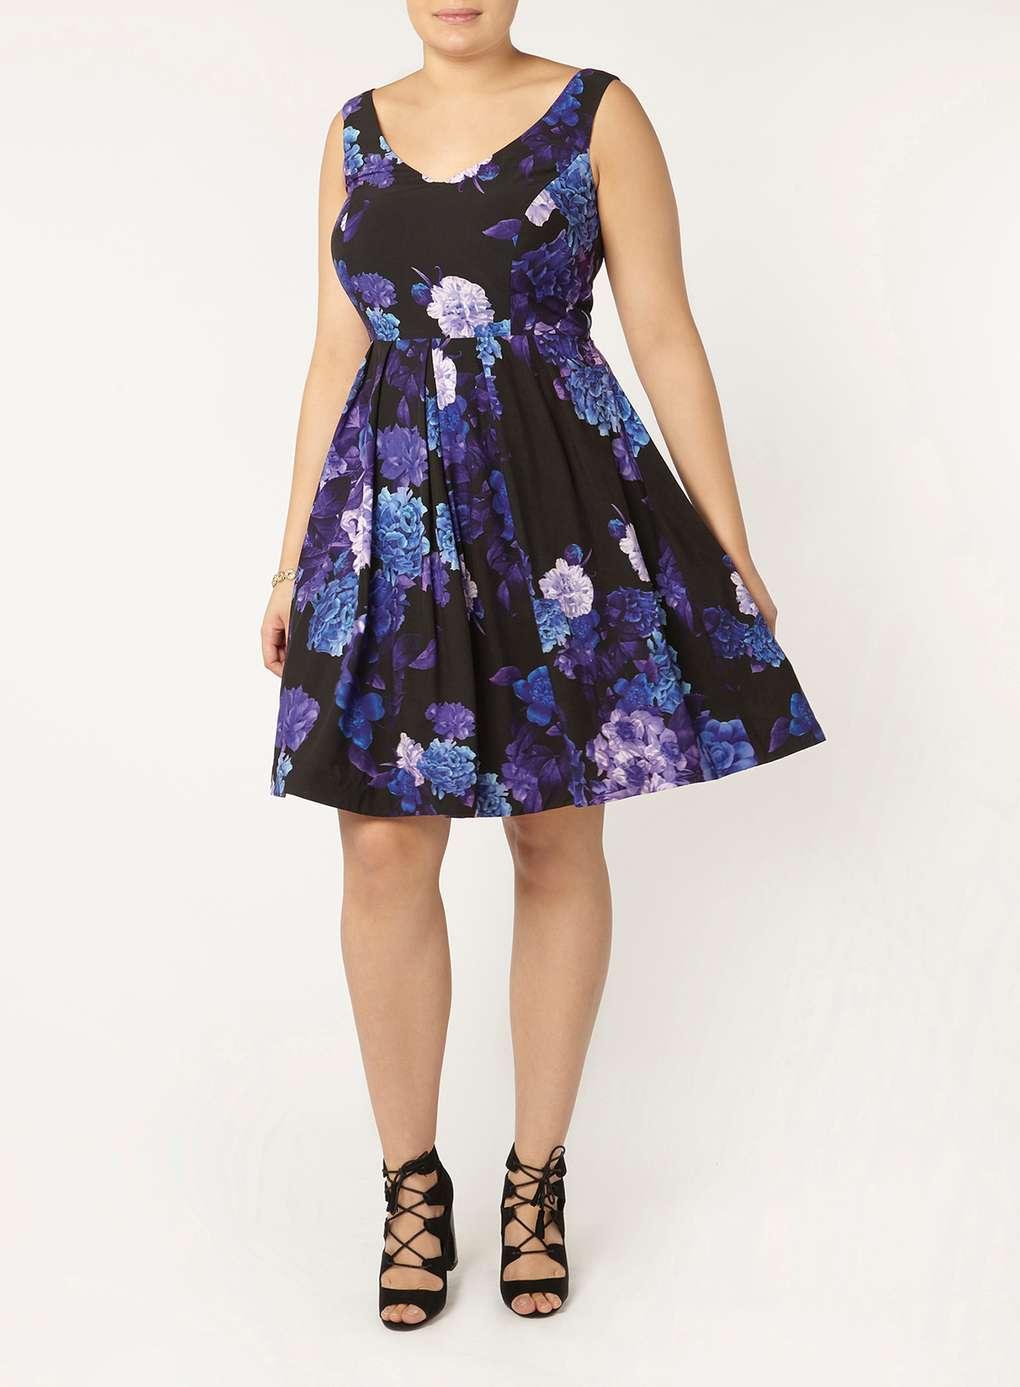 6f8bb1102d2c City Chic Black Floral Printed Dress - Evans